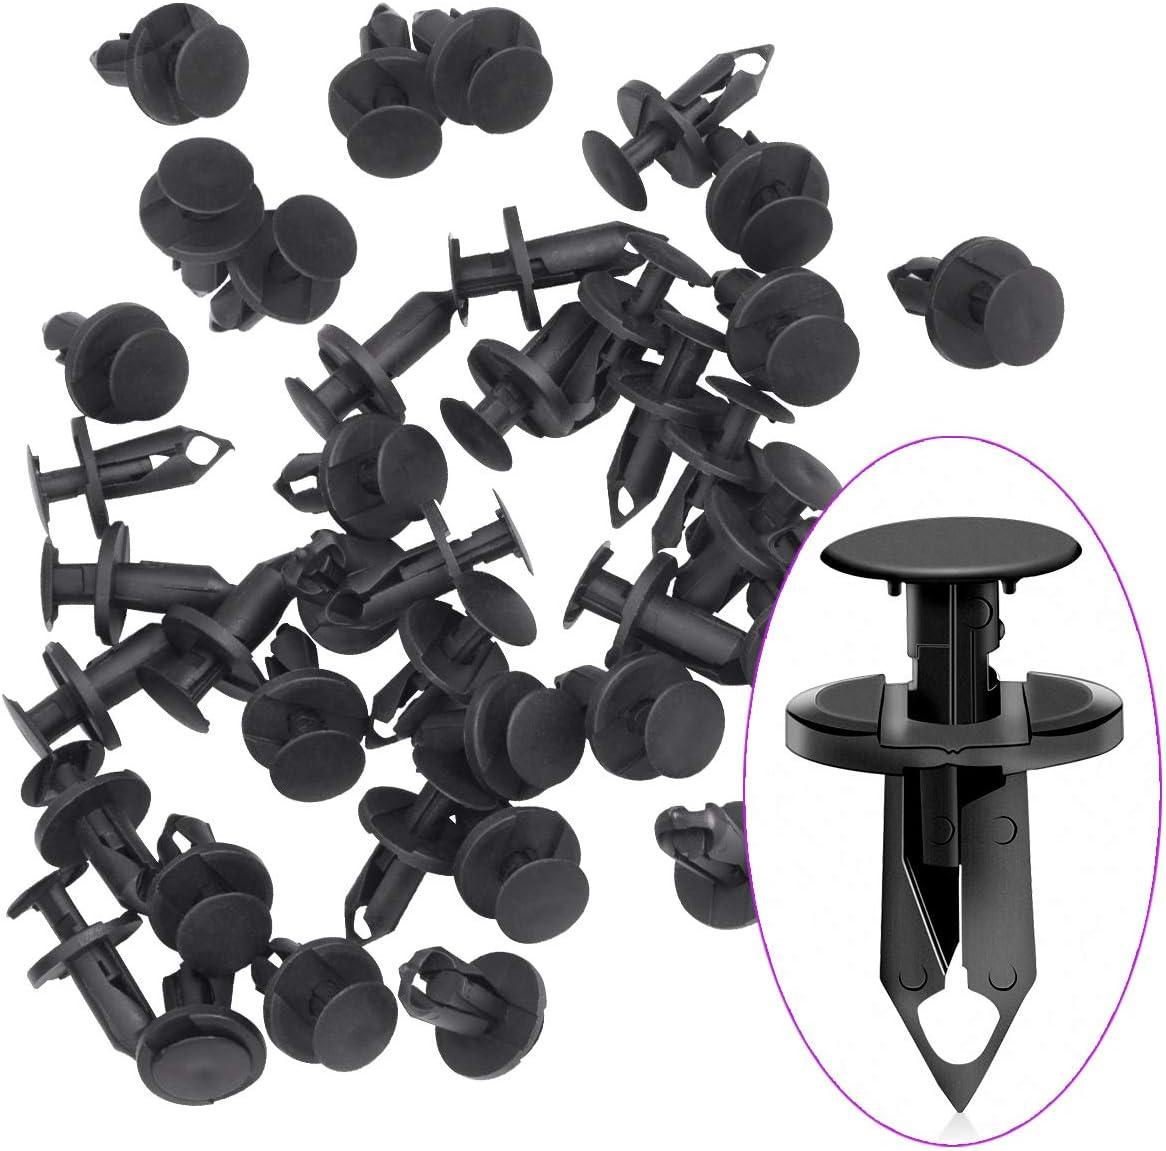 Black 100pcs 8mm Car Hole Plastic Rivets Fastener Fender Bumper Push Pin Clips